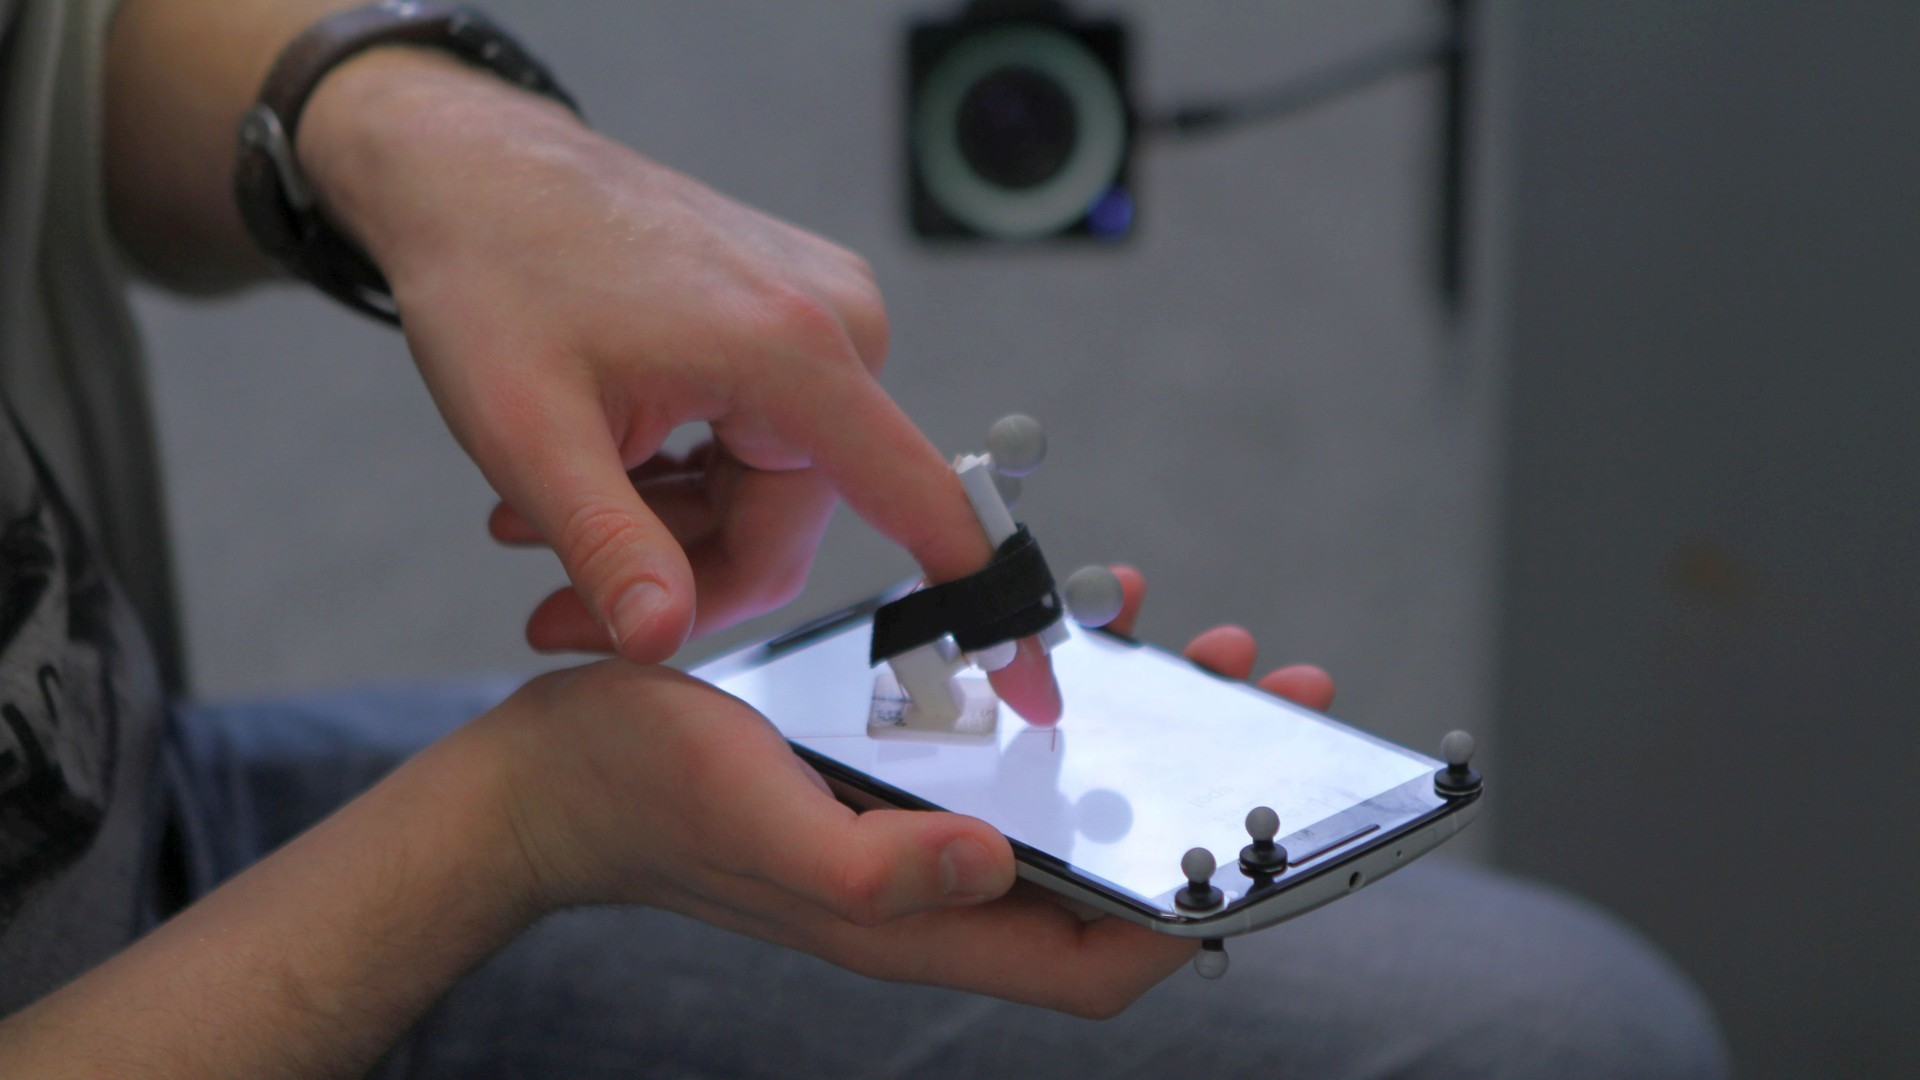 Designing Finger Orientation Input for Mobile Touchscreens